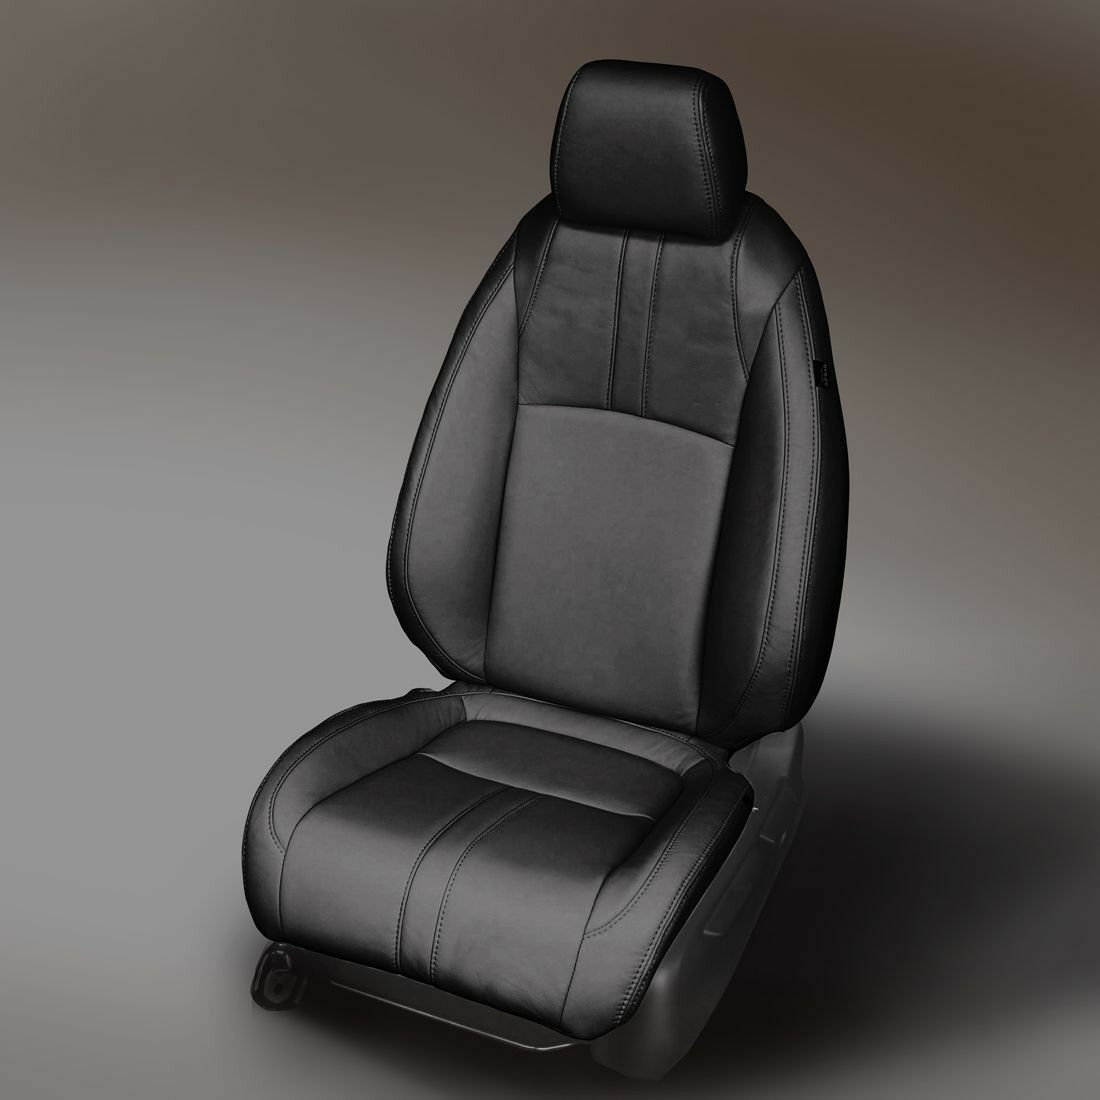 2019 honda civic seat covers jeep grand cherokee headlight